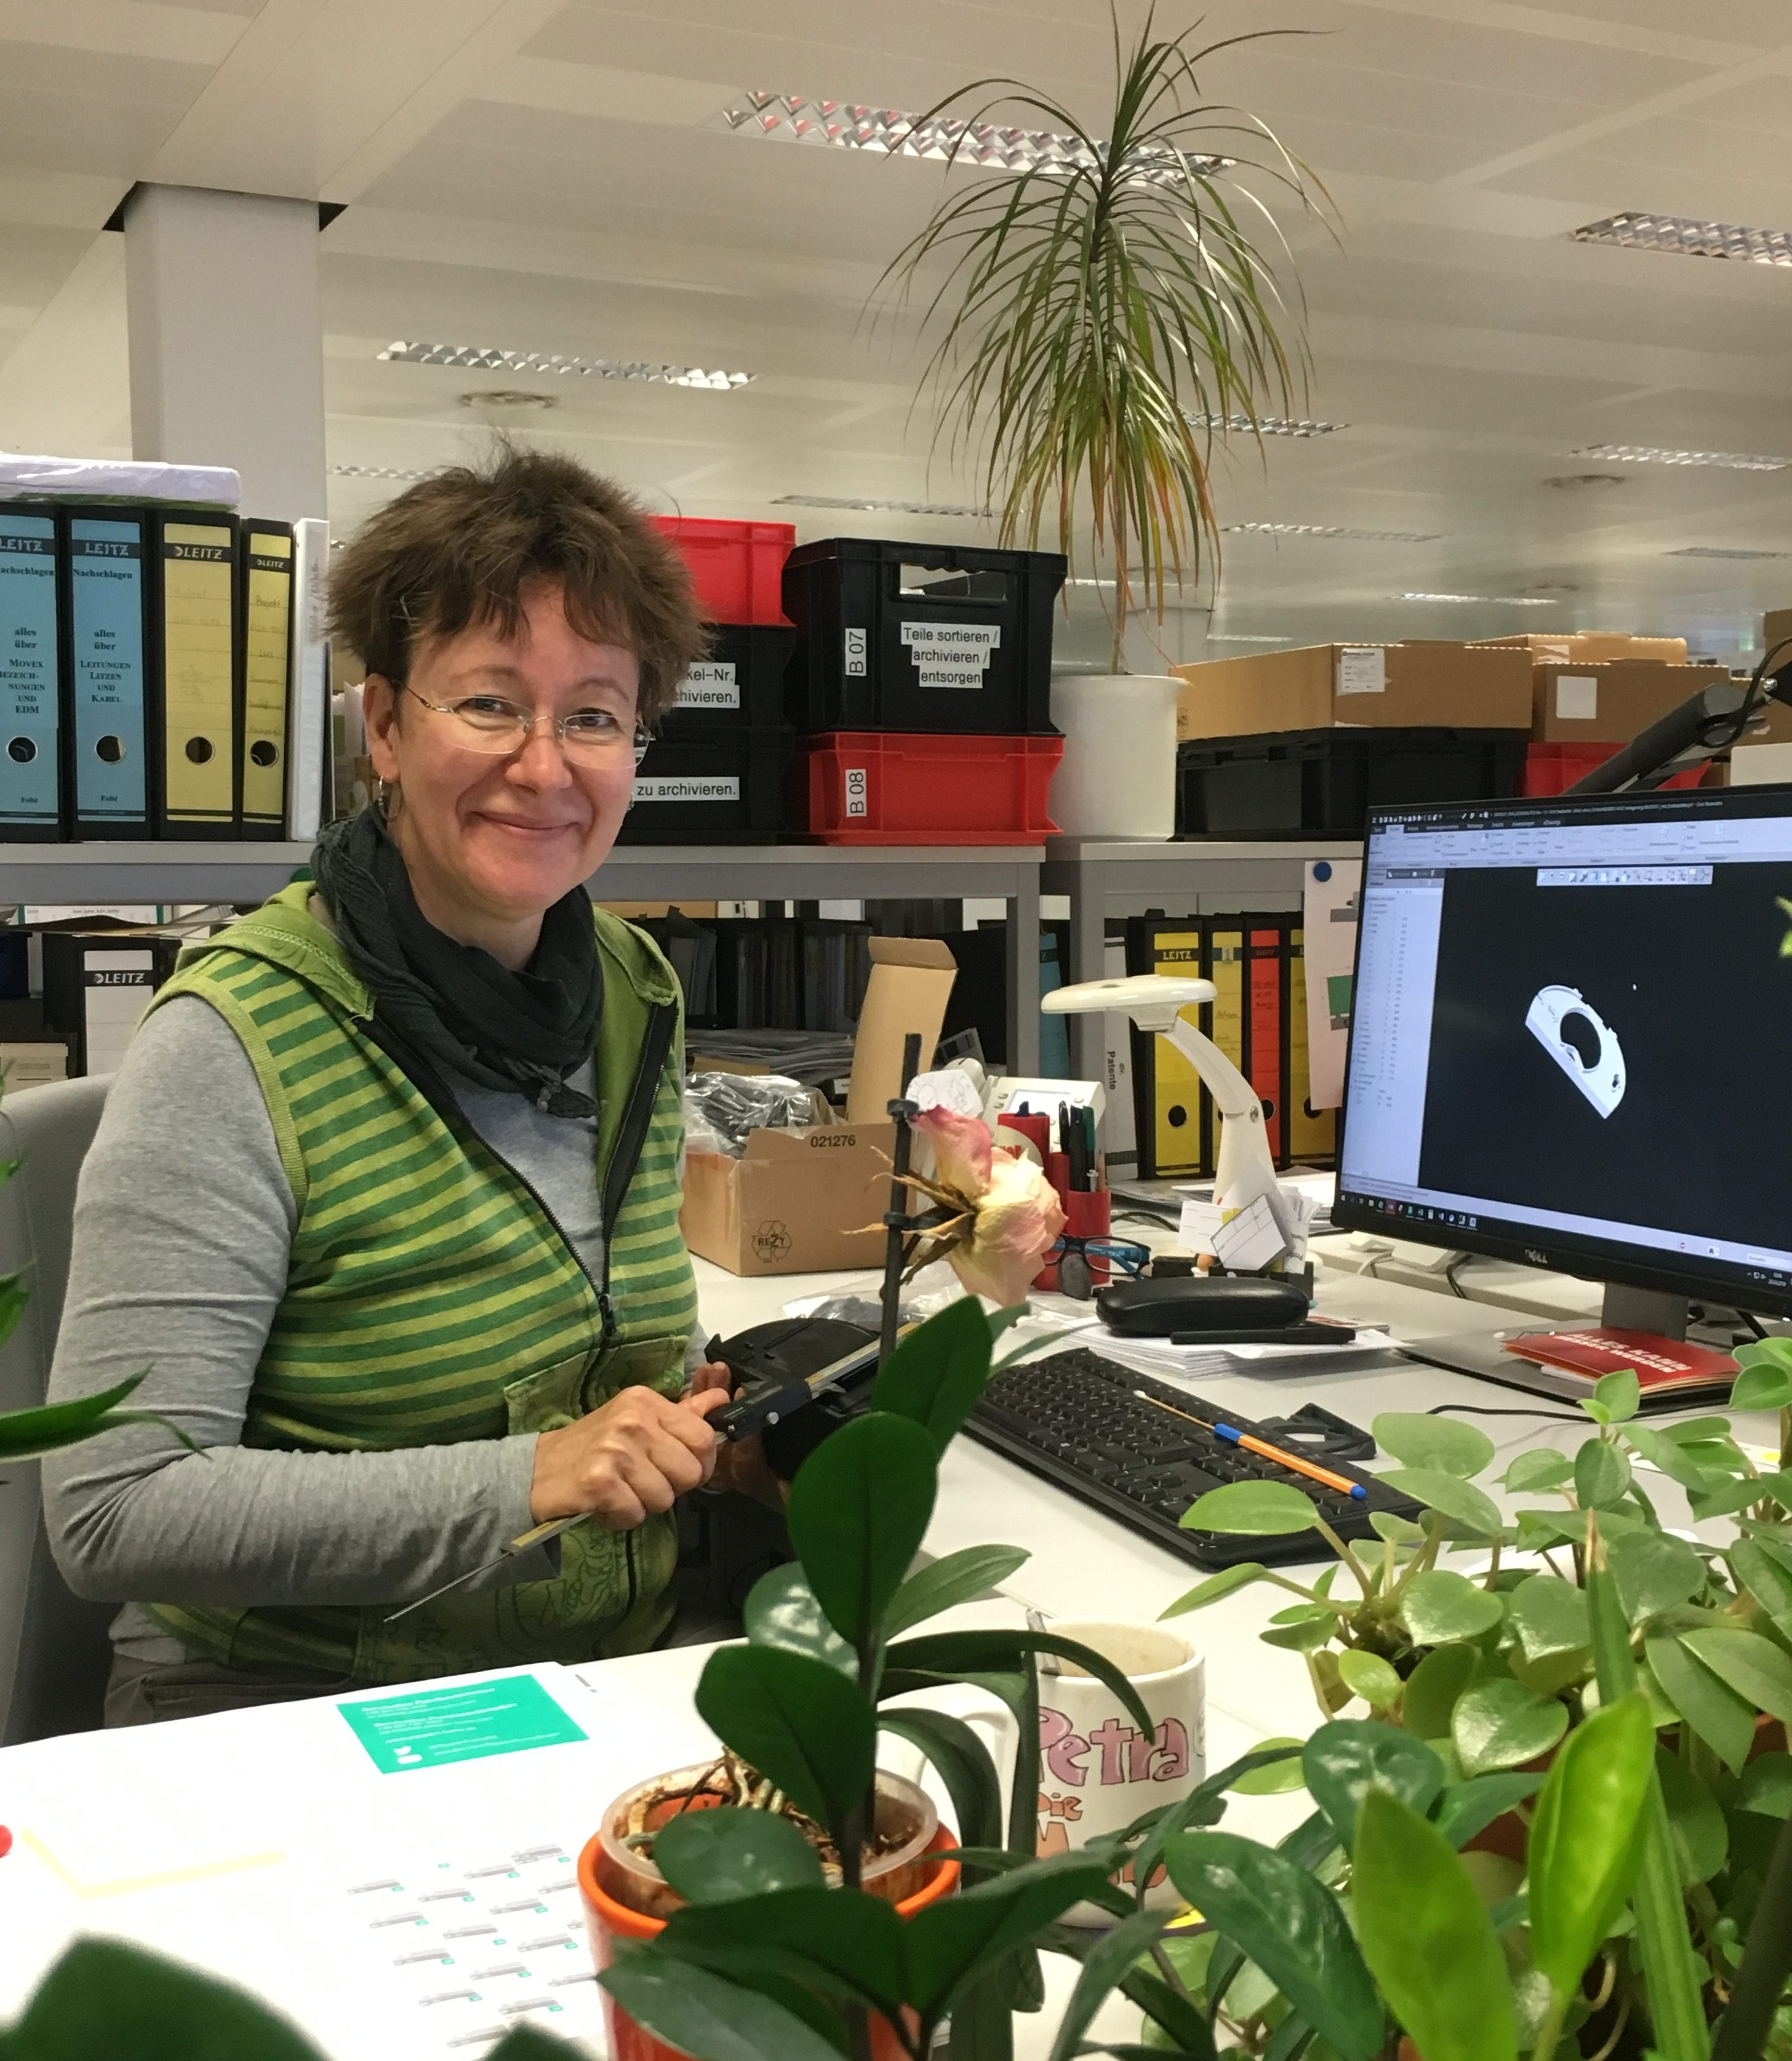 Konstrukteurin Petra an ihrem Arbeitsplatz